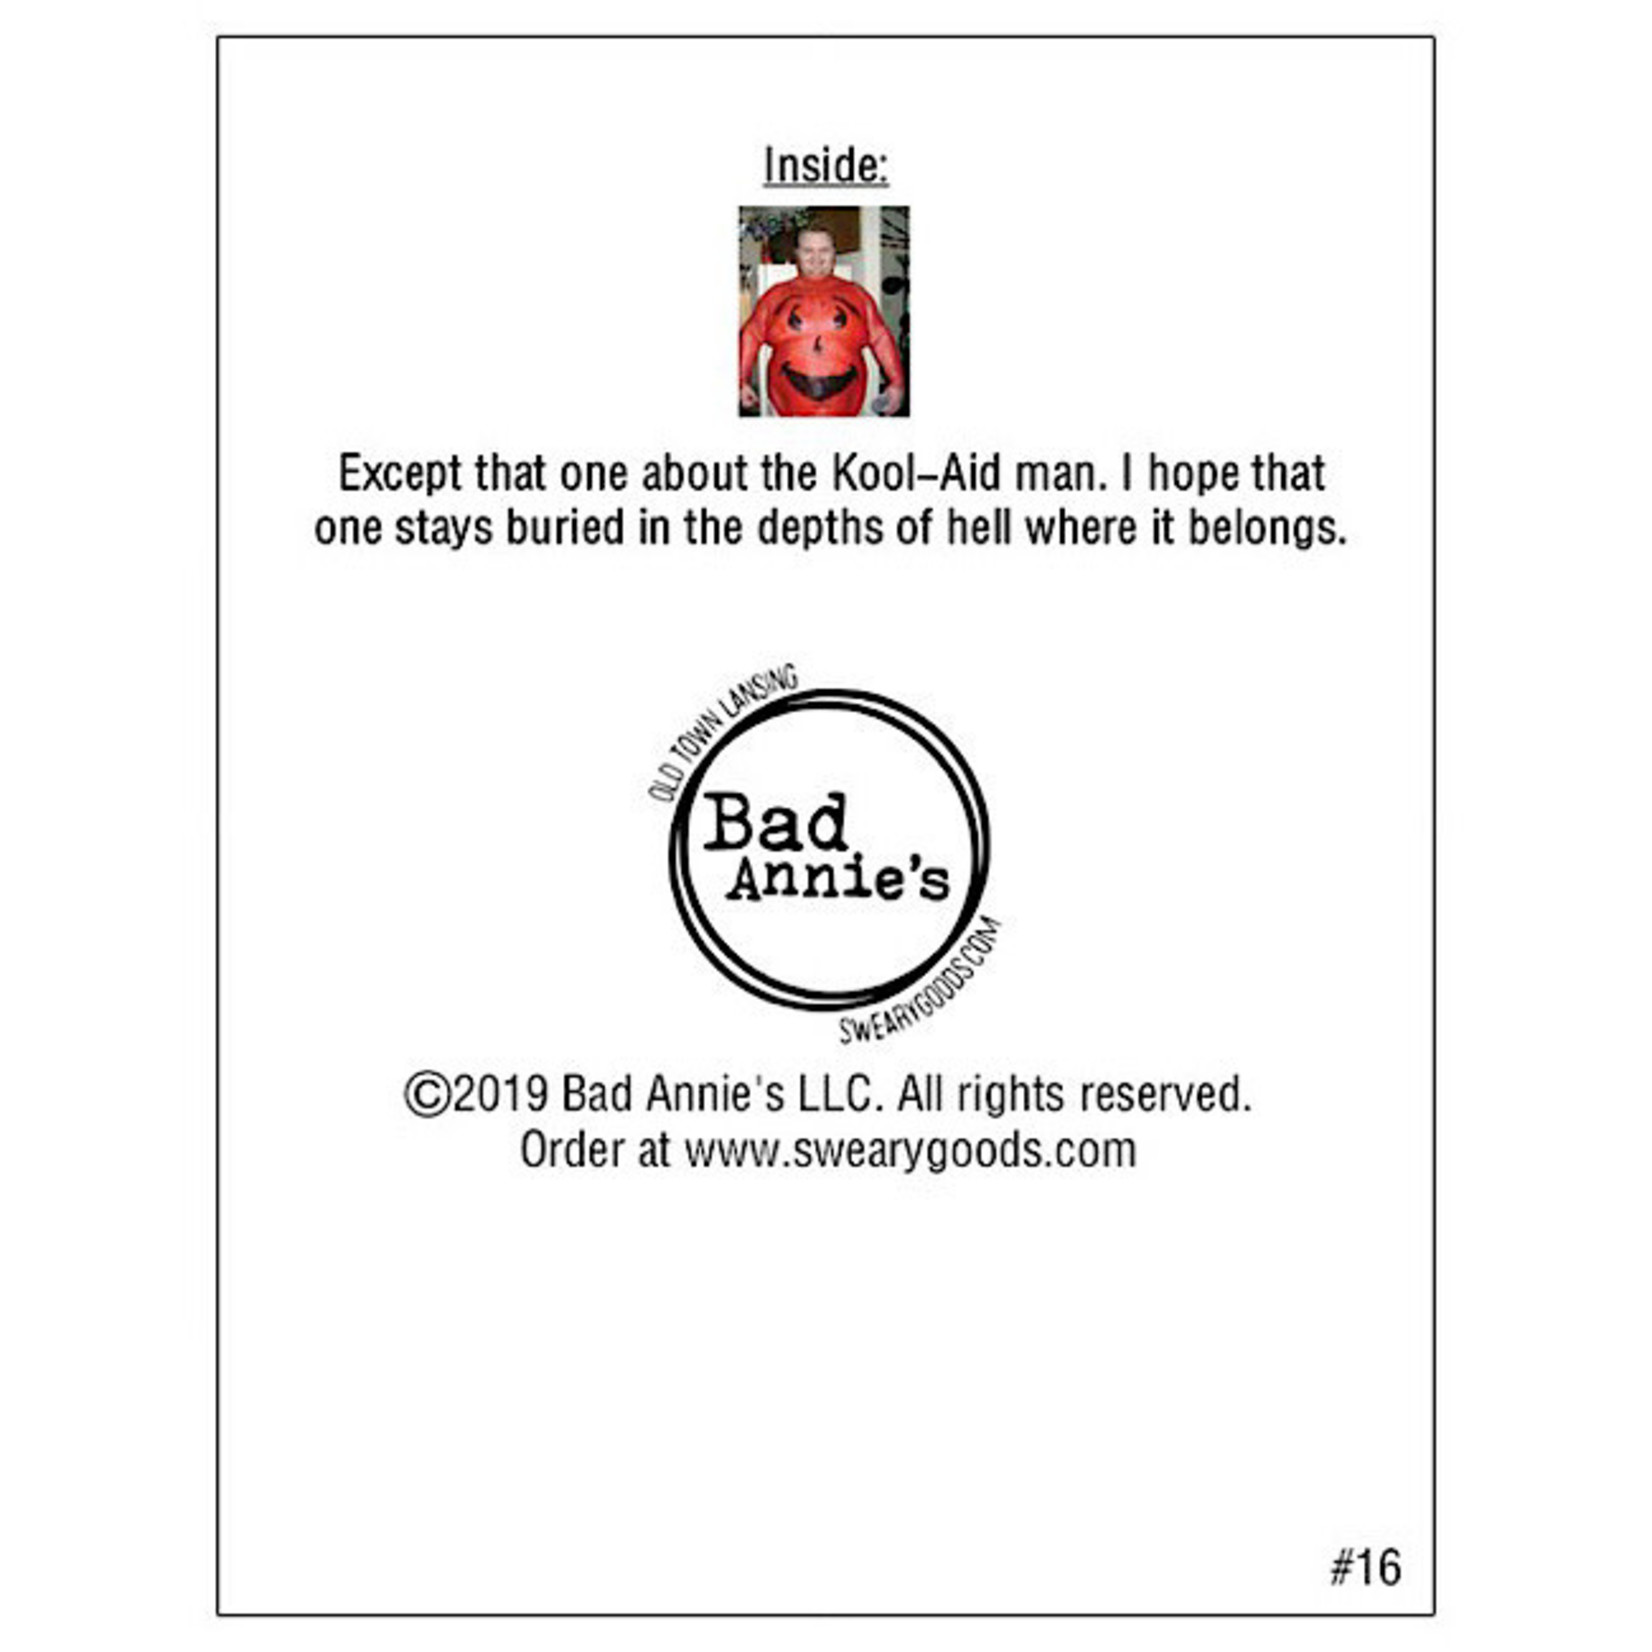 Bad Annie's Card #016 - Birthday Dreams Come True